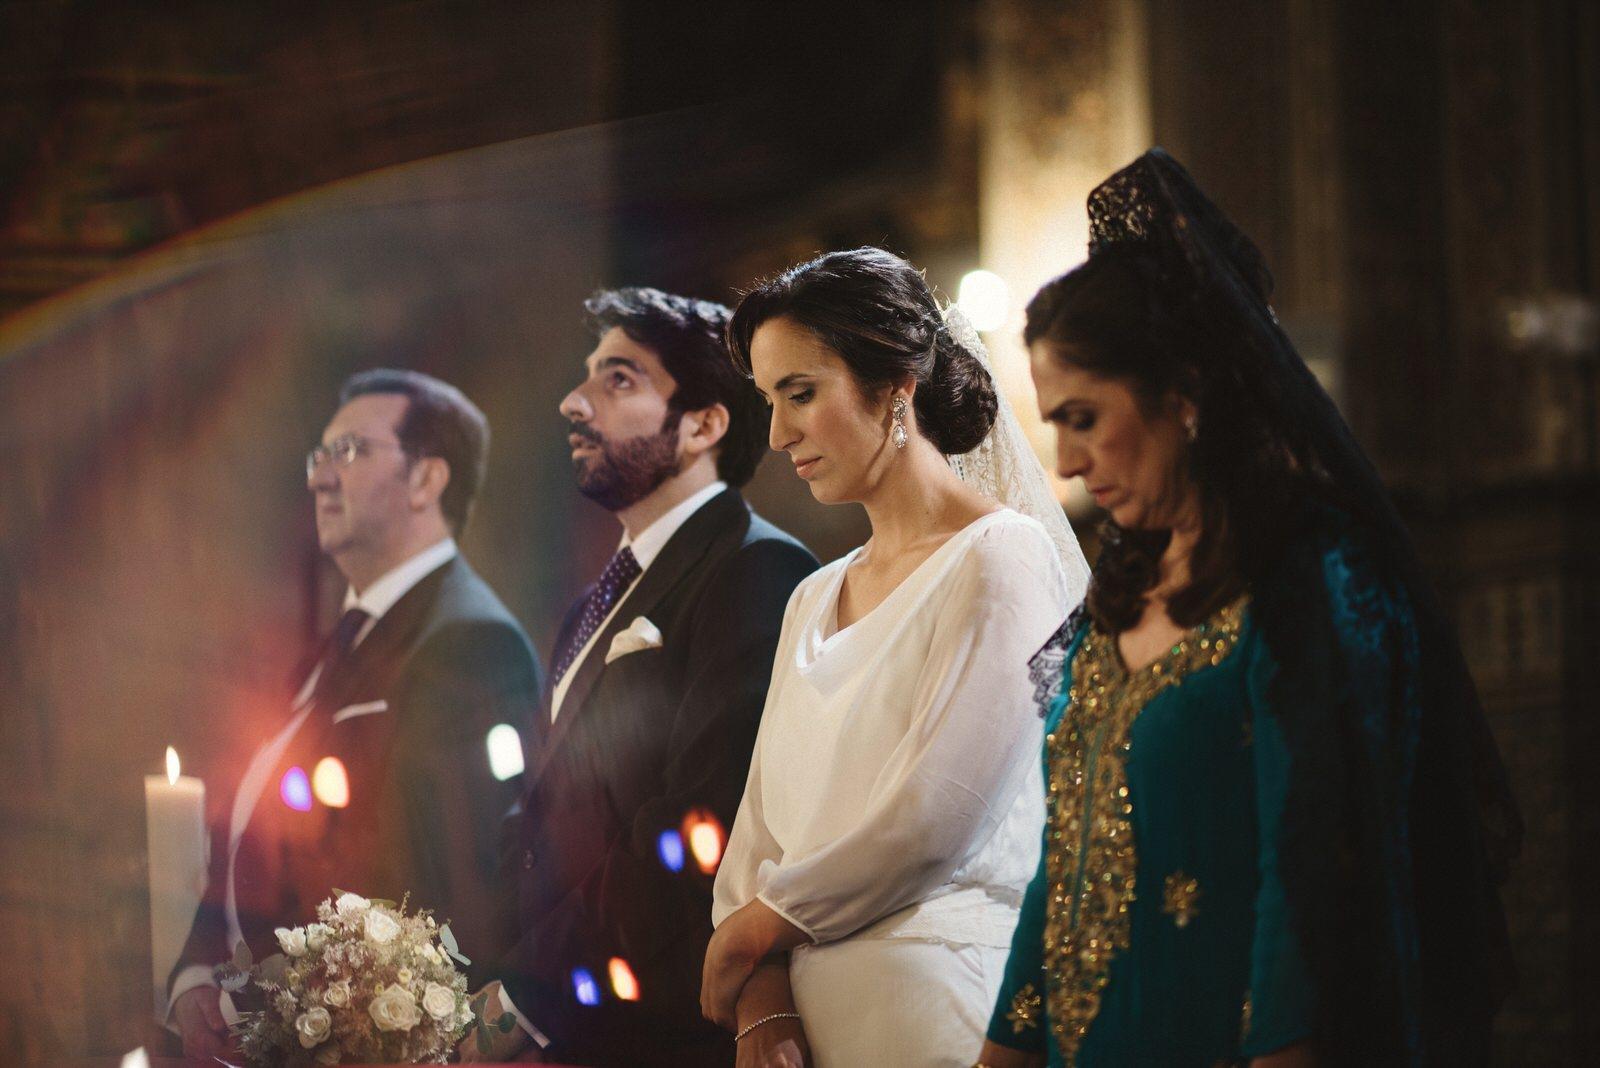 fotografo de bodas sevilla - fotografo boda - fotografía sevilla - Andrés AmarilloAAA_5079- tele- fine.JPG